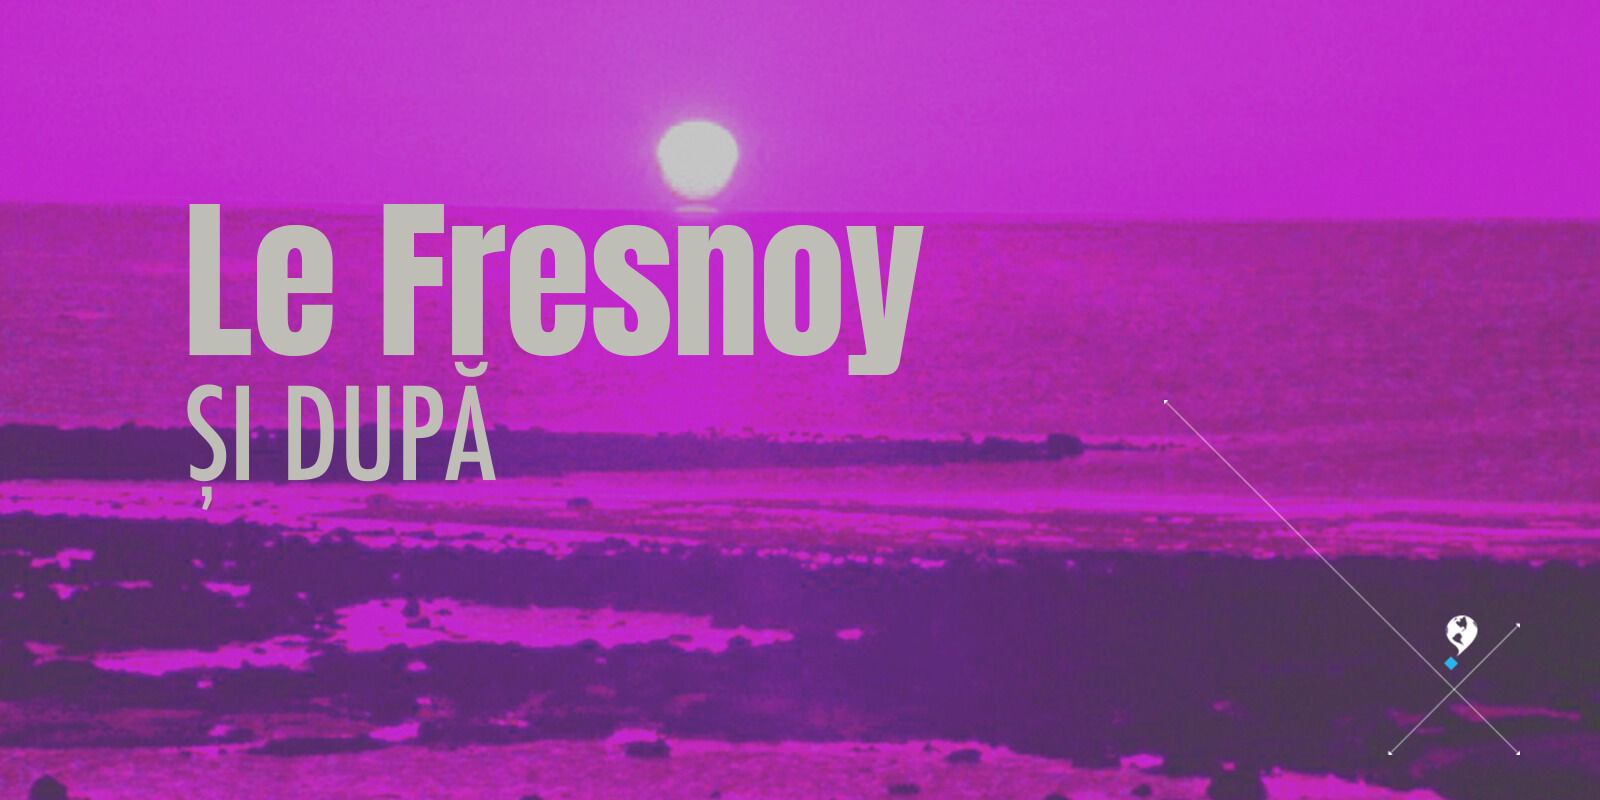 CINECLUB OWR ONLINE: LE FRESNOY ȘI DUPĂ